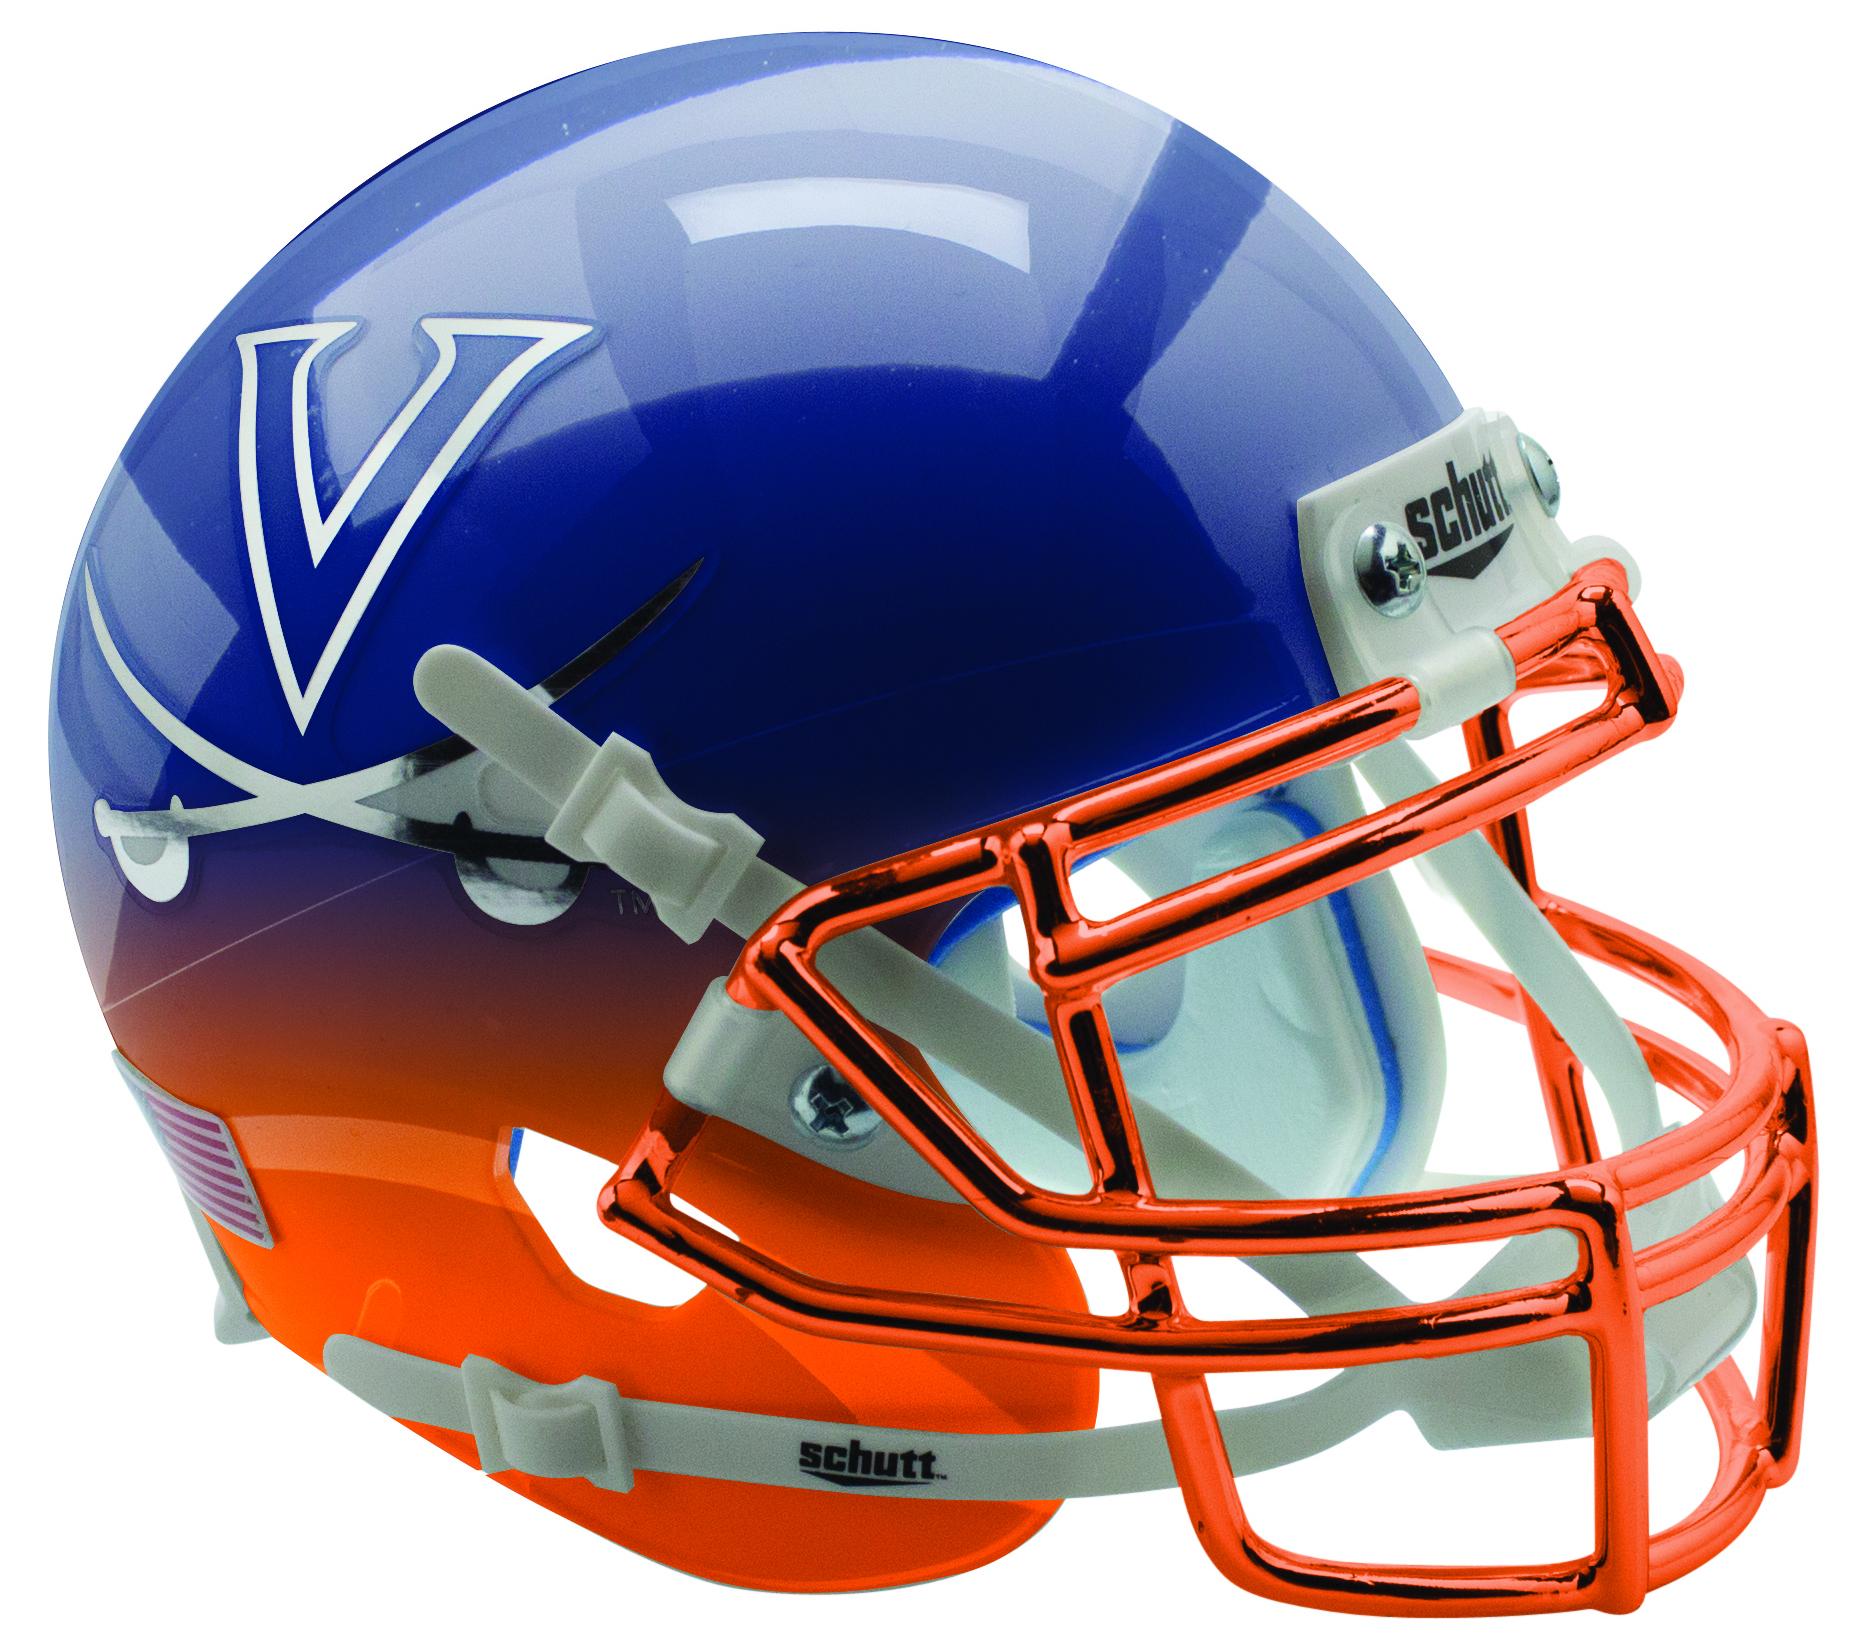 Virginia Cavaliers Mini XP Authentic Helmet Schutt <B>Navy Orange Featherhead with Chrome Mask</B>